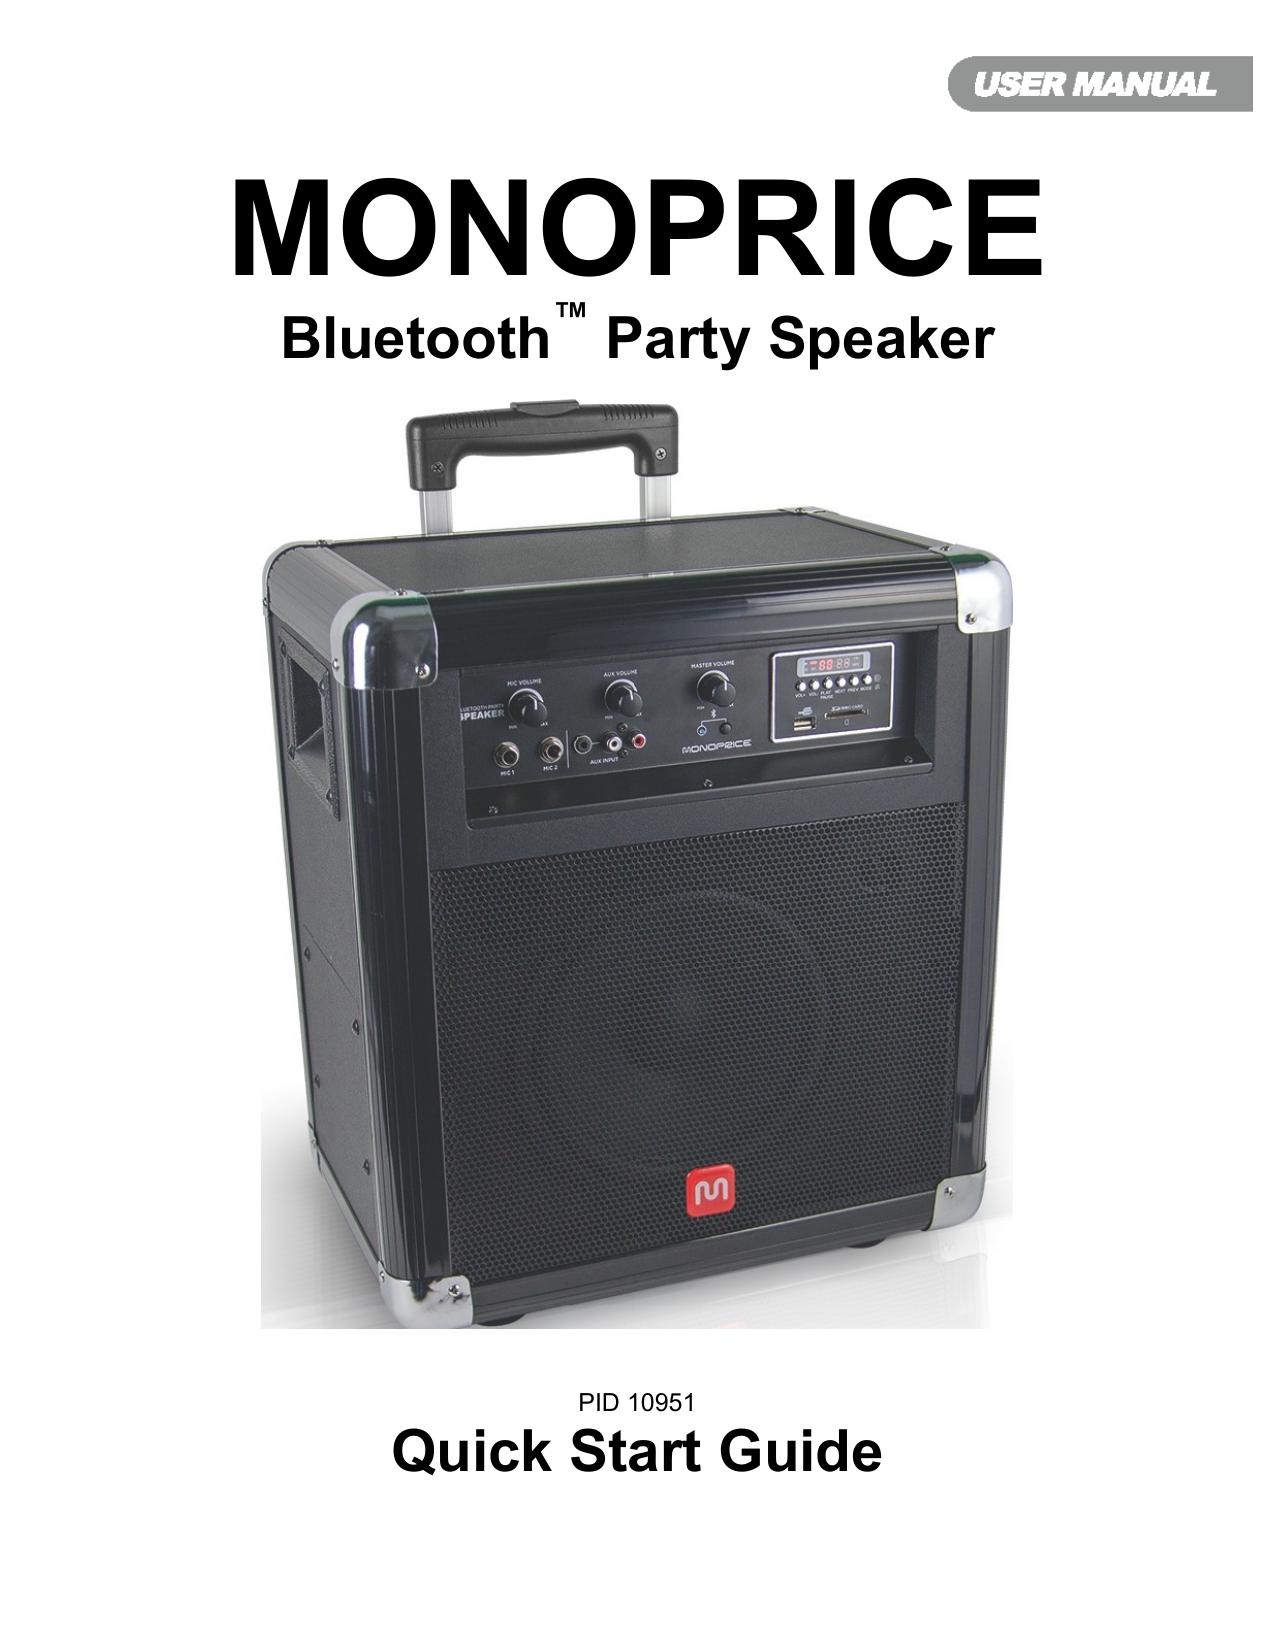 MONOPRICE Bluetooth ™ Party Speaker  Manualzz